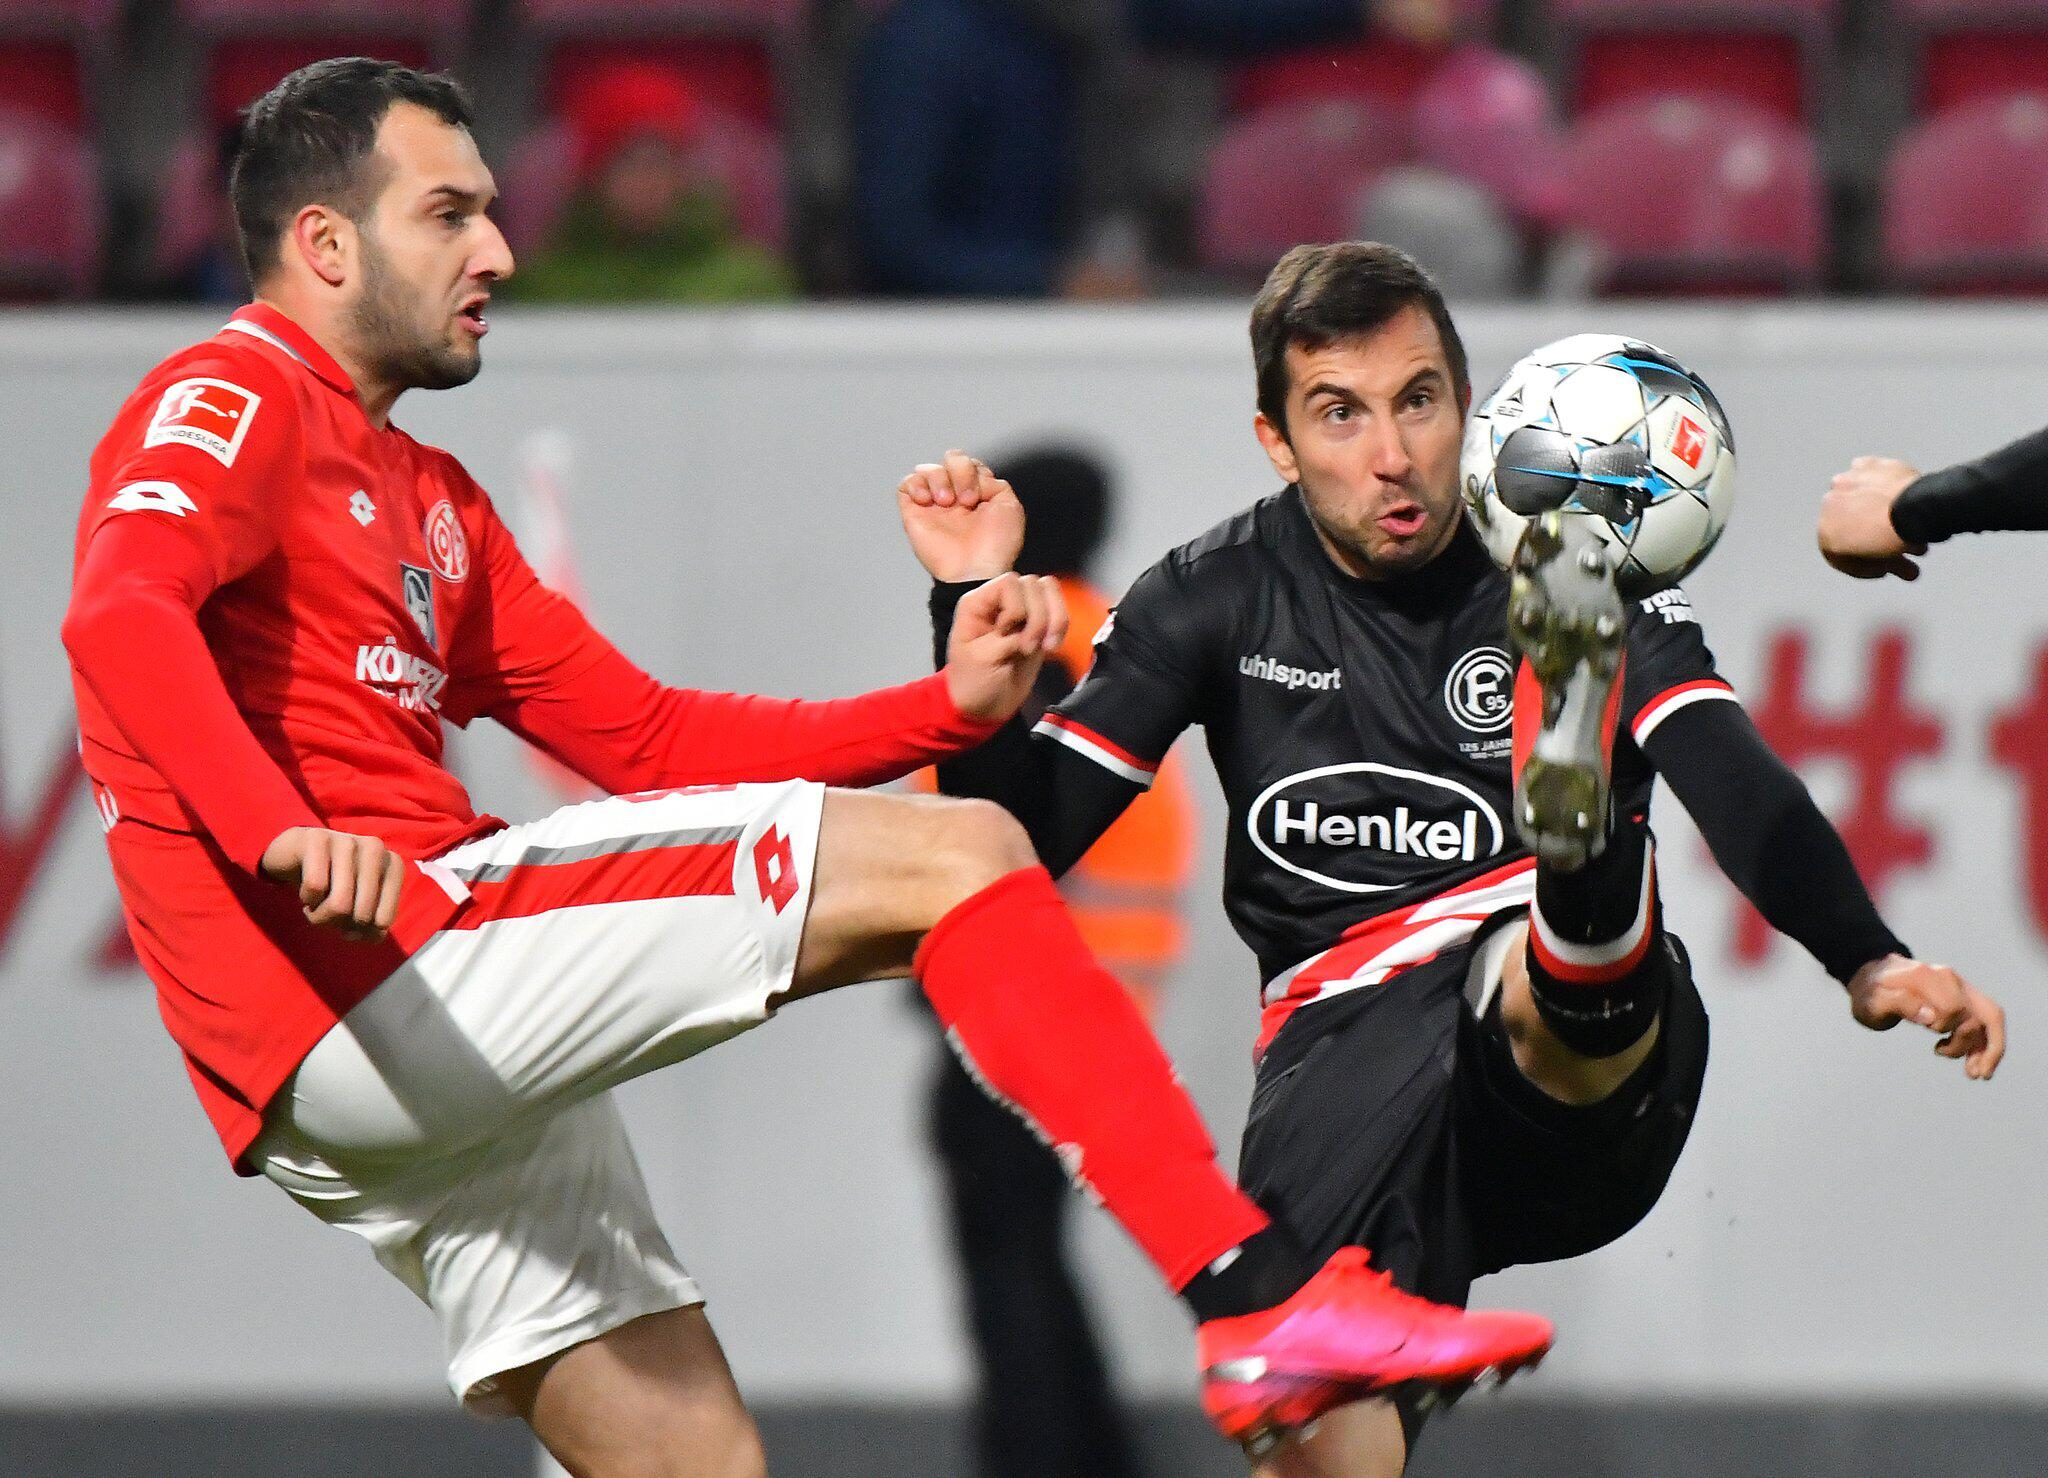 Bild zu FSV Mainz 05 - Fortuna Düsseldorf